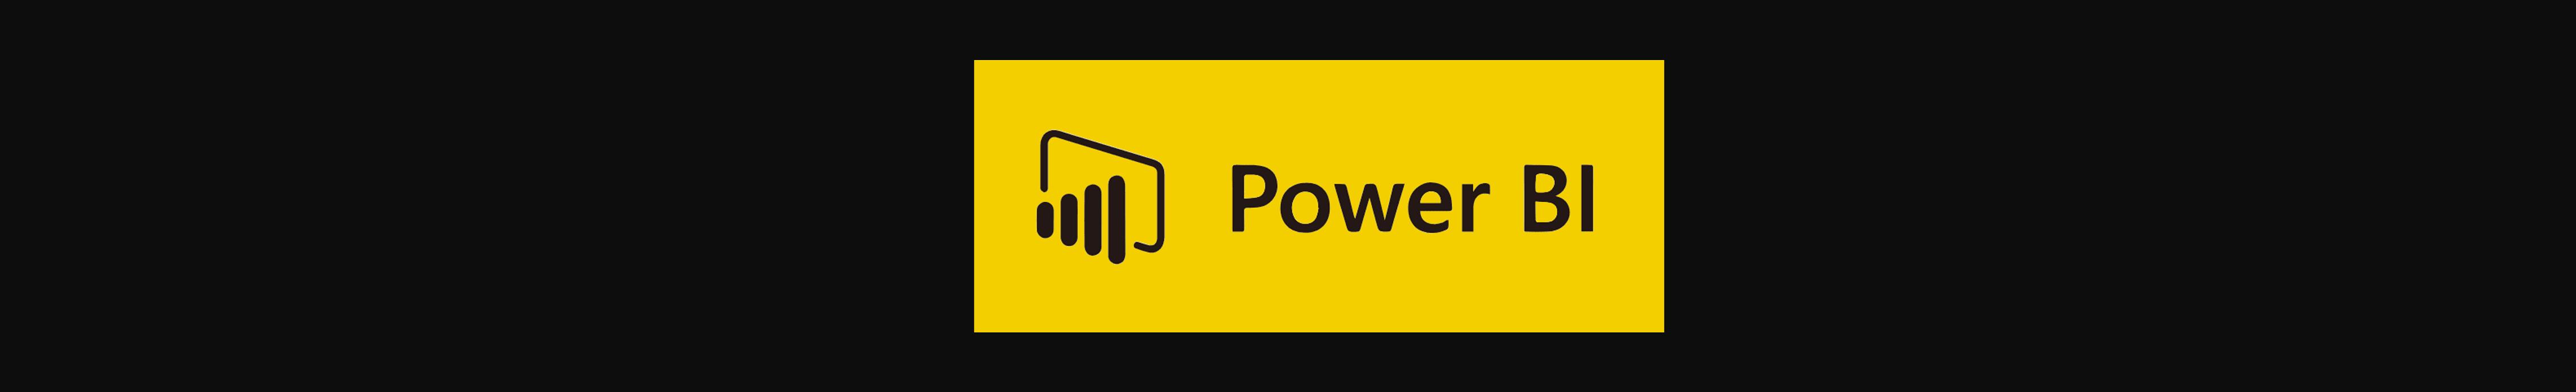 Power BI Logo - Top 10 Data Analytics Tools - Edureka